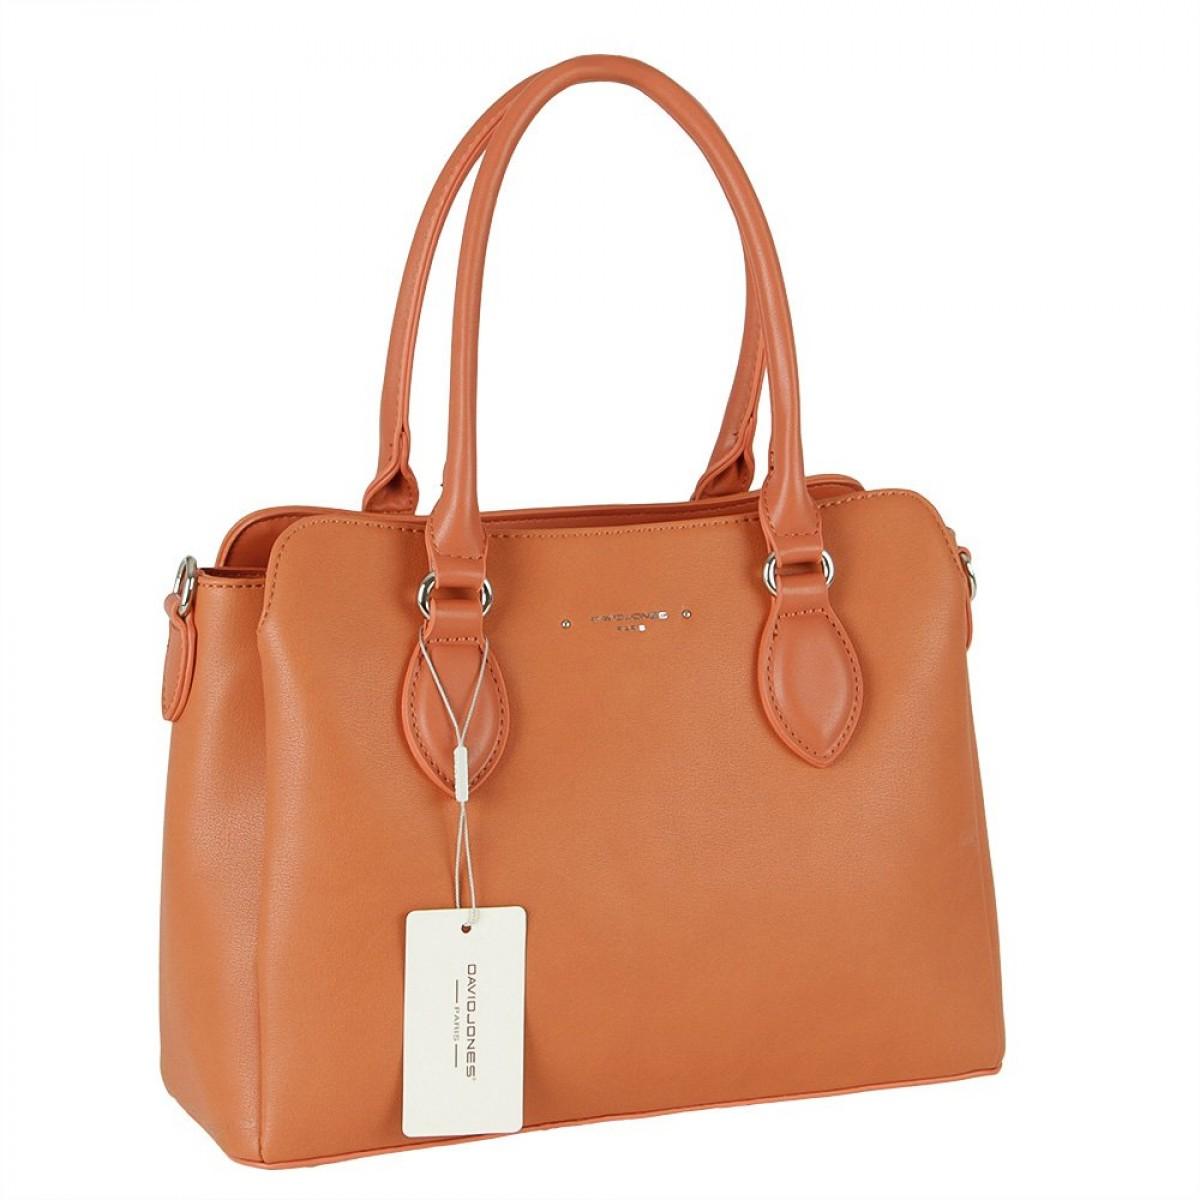 Жіноча сумка David Jones 6295-2 CORAL